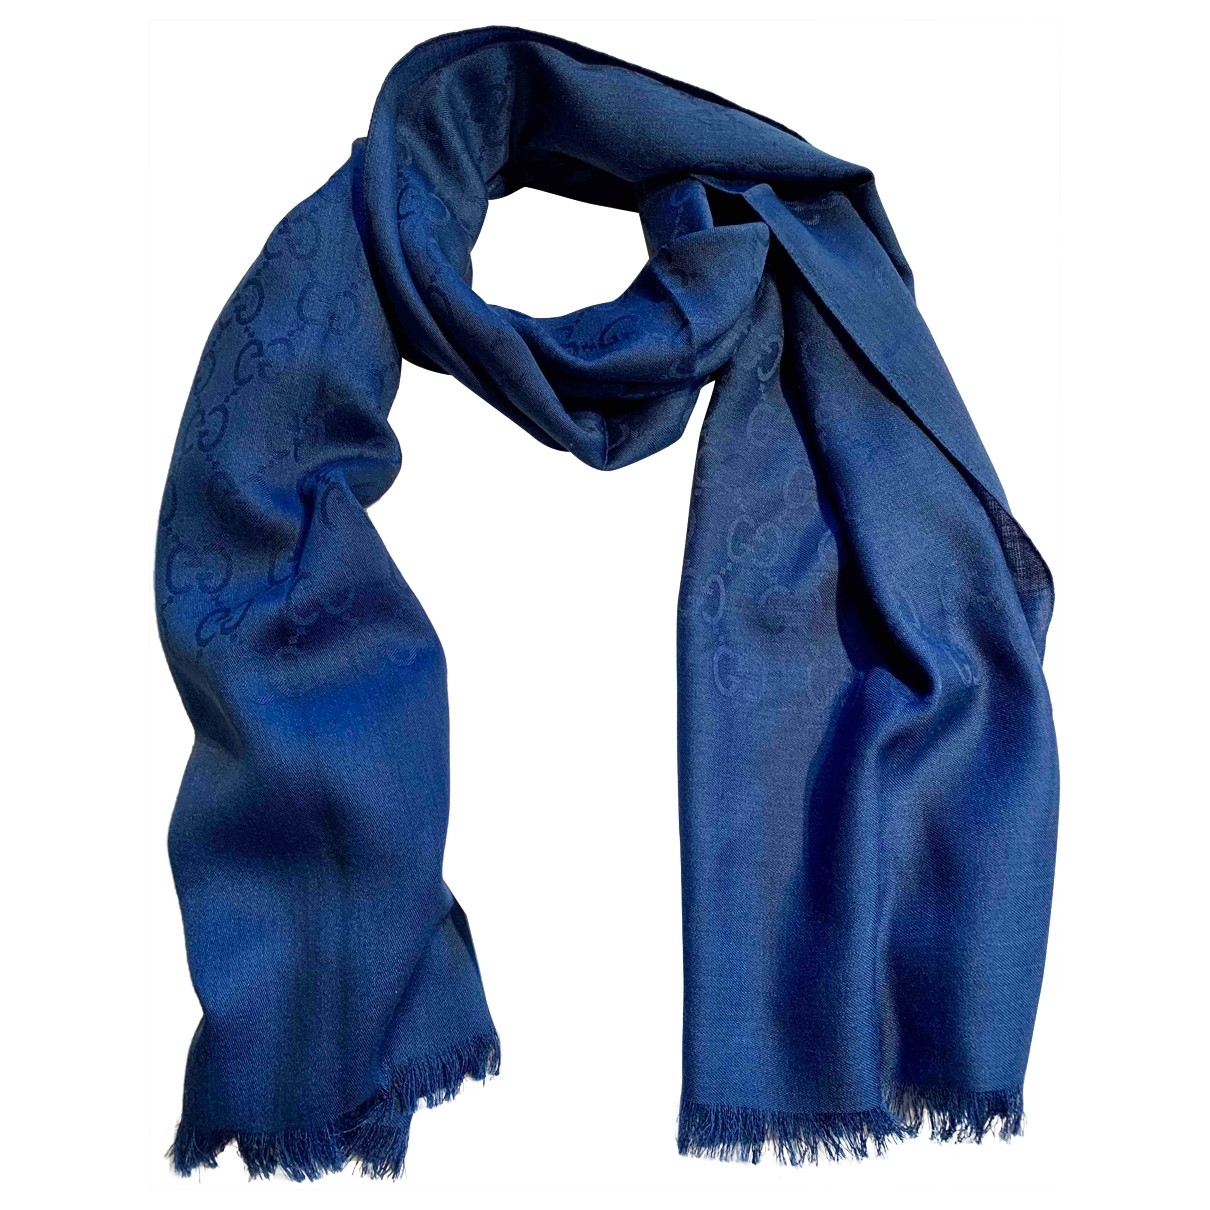 Gucci \N Schal in  Blau Wolle